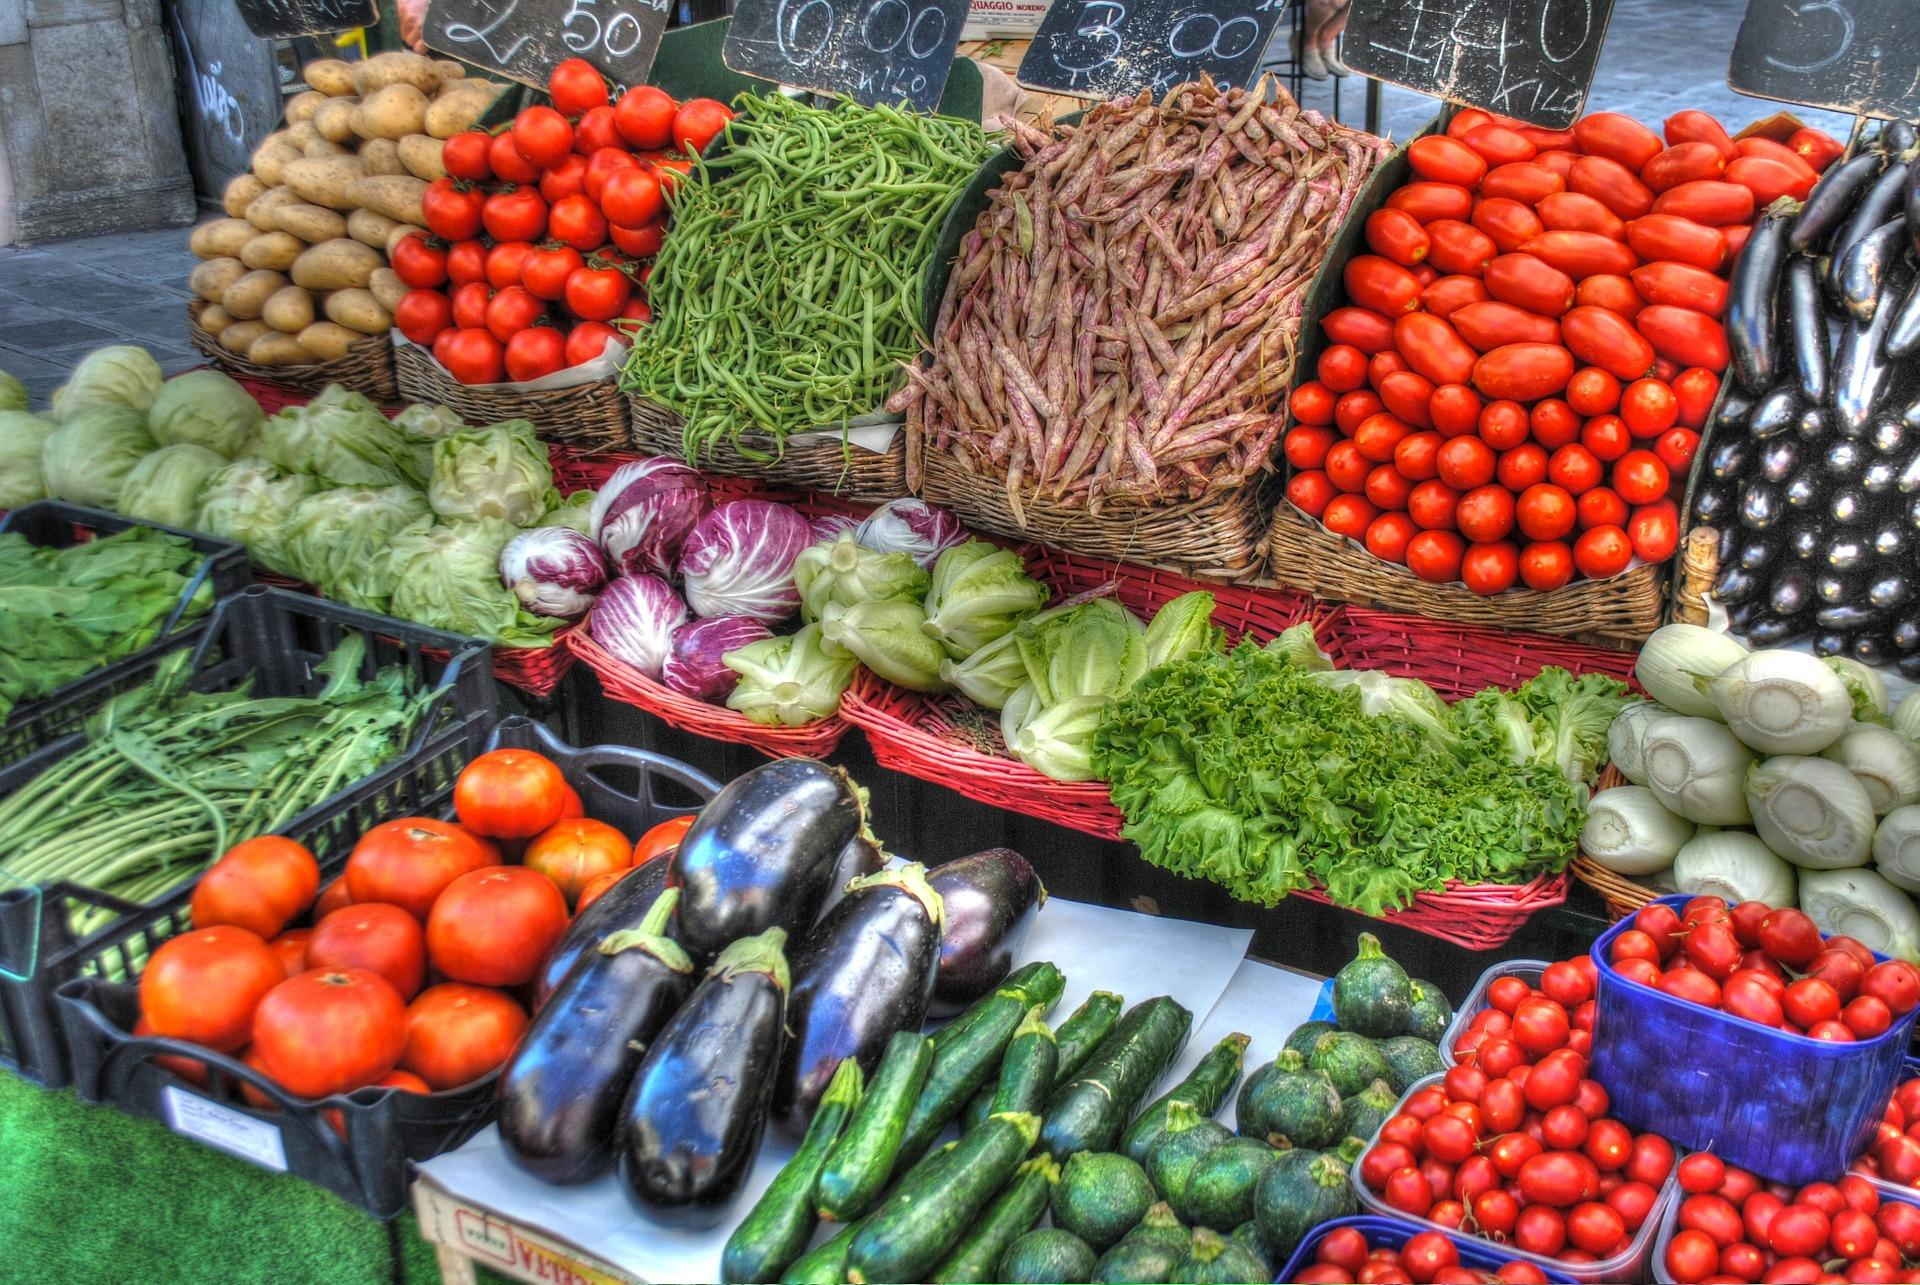 vegetables-353926_1920.jpg